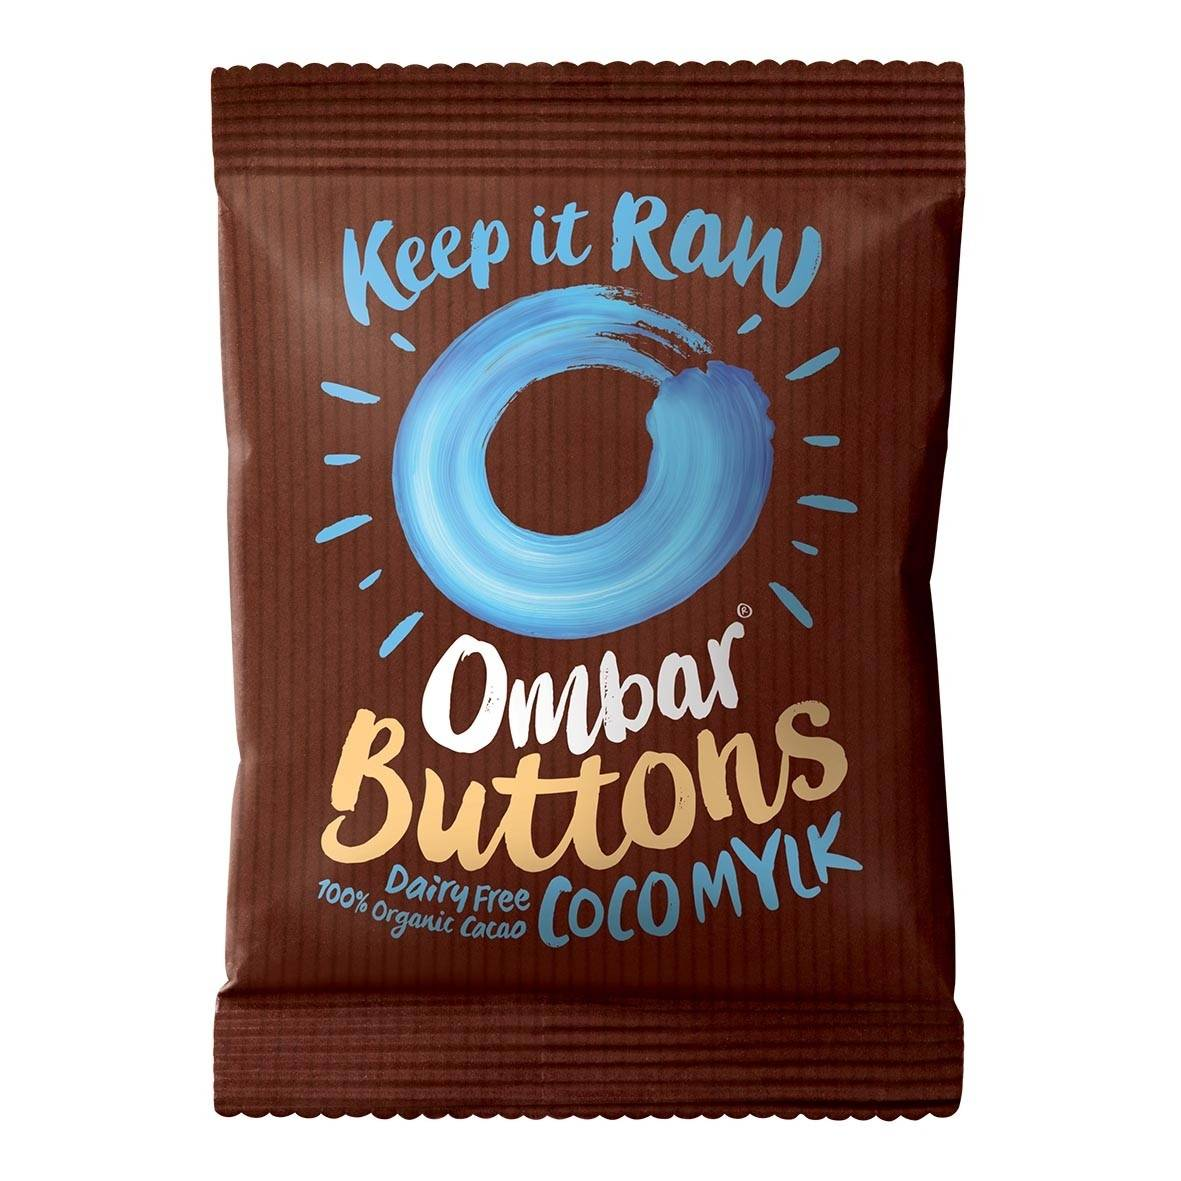 Lechoppebio Buttons - Chocolat Cru Crème de Coco 25g Bio - Ombar